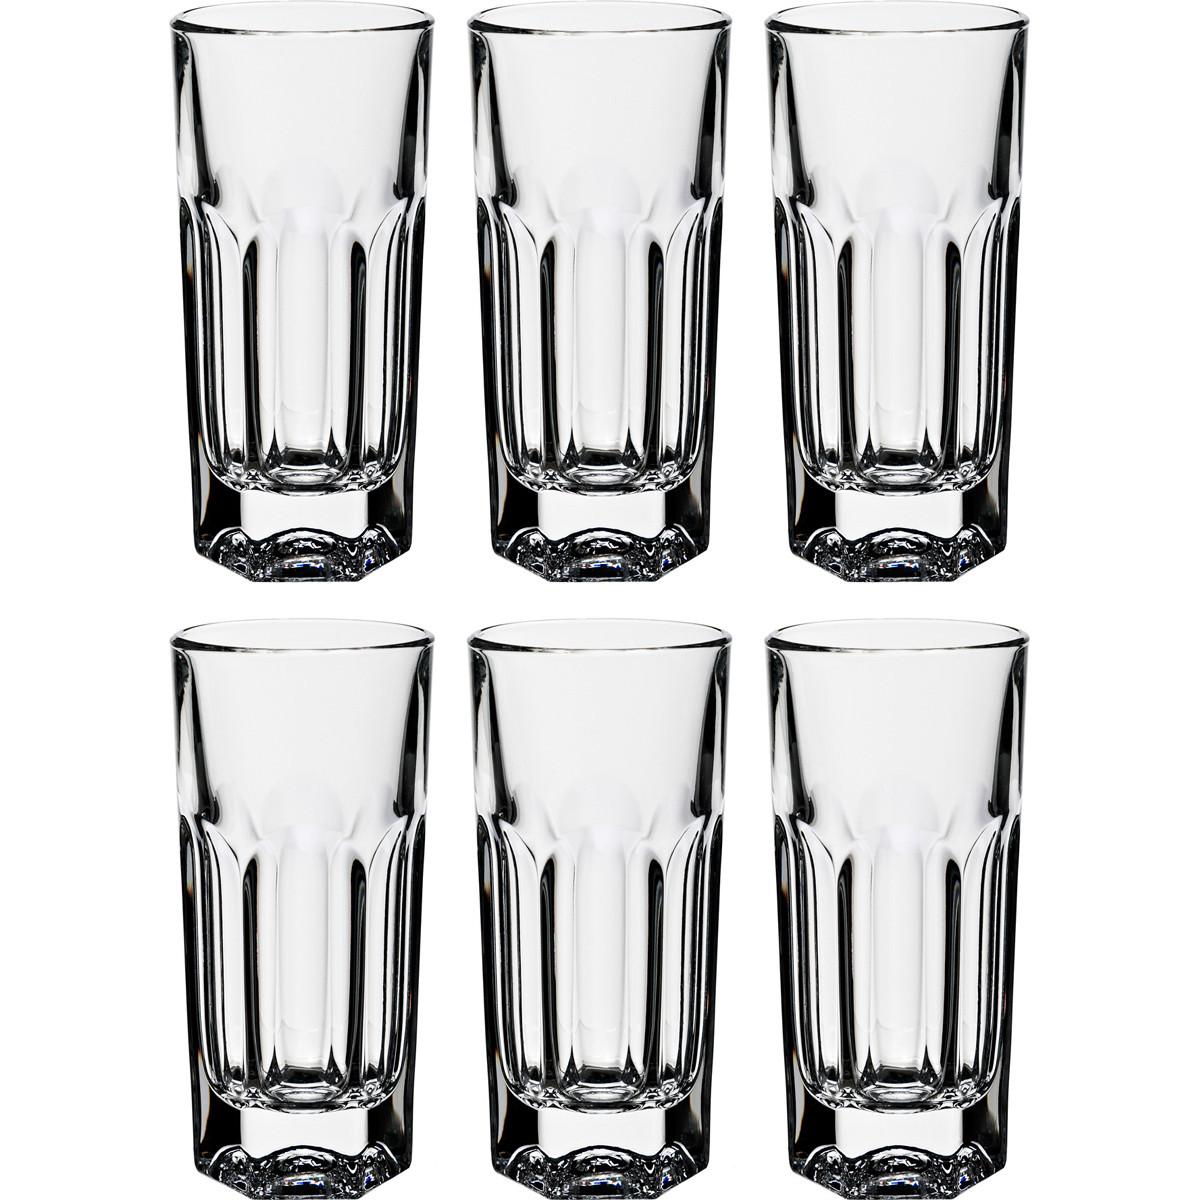 {} RCR Набор стаканов John (370 мл - 6 шт) набор стаканов rcr адажио 400 мл 6 шт